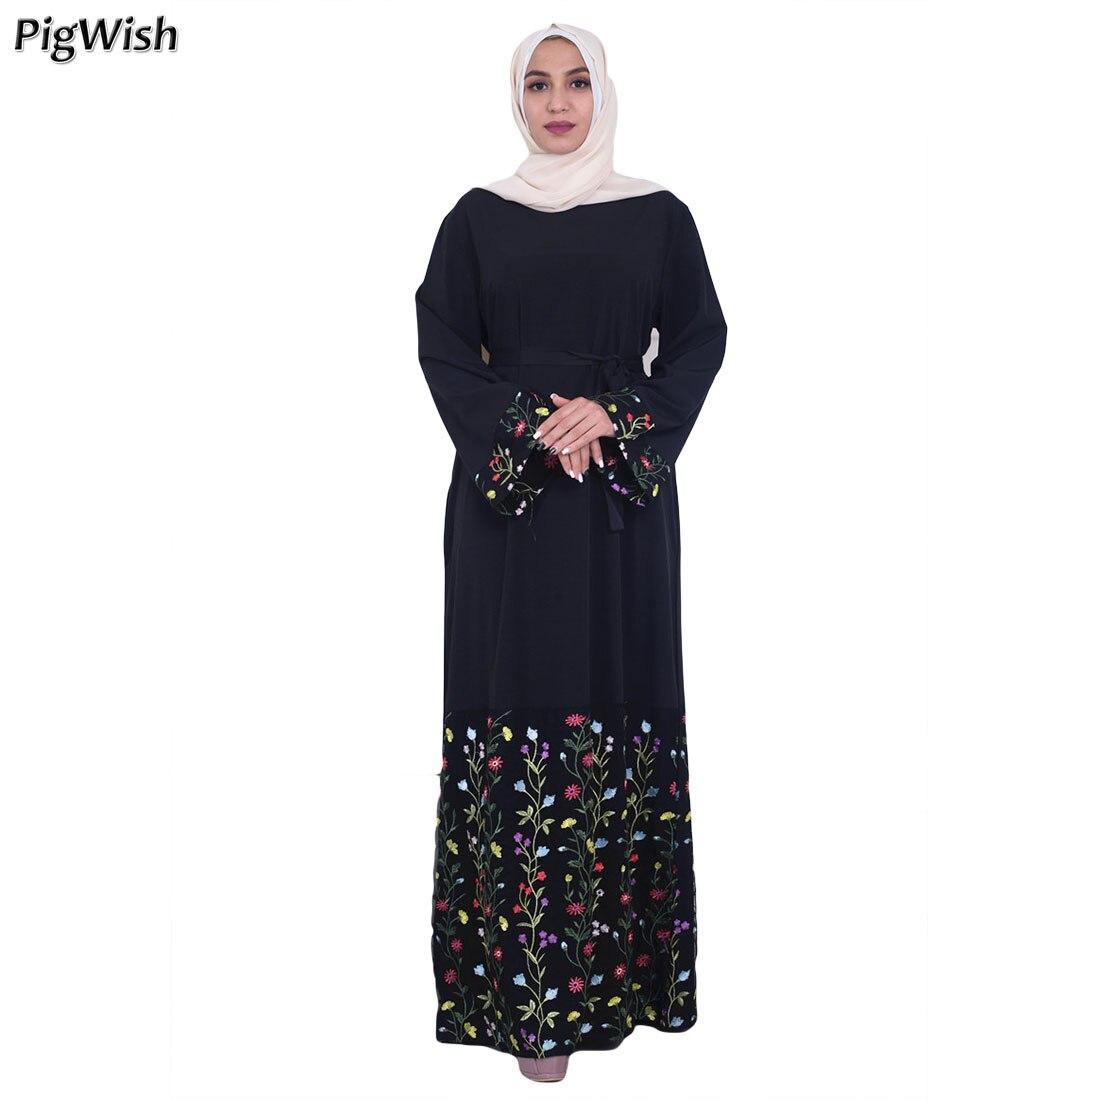 aeab2f96f4d7 Cheap Islamic Clothing, Buy Directly from China Suppliers:Muslim Dress  Embroidery Abaya Dubai Kaftan